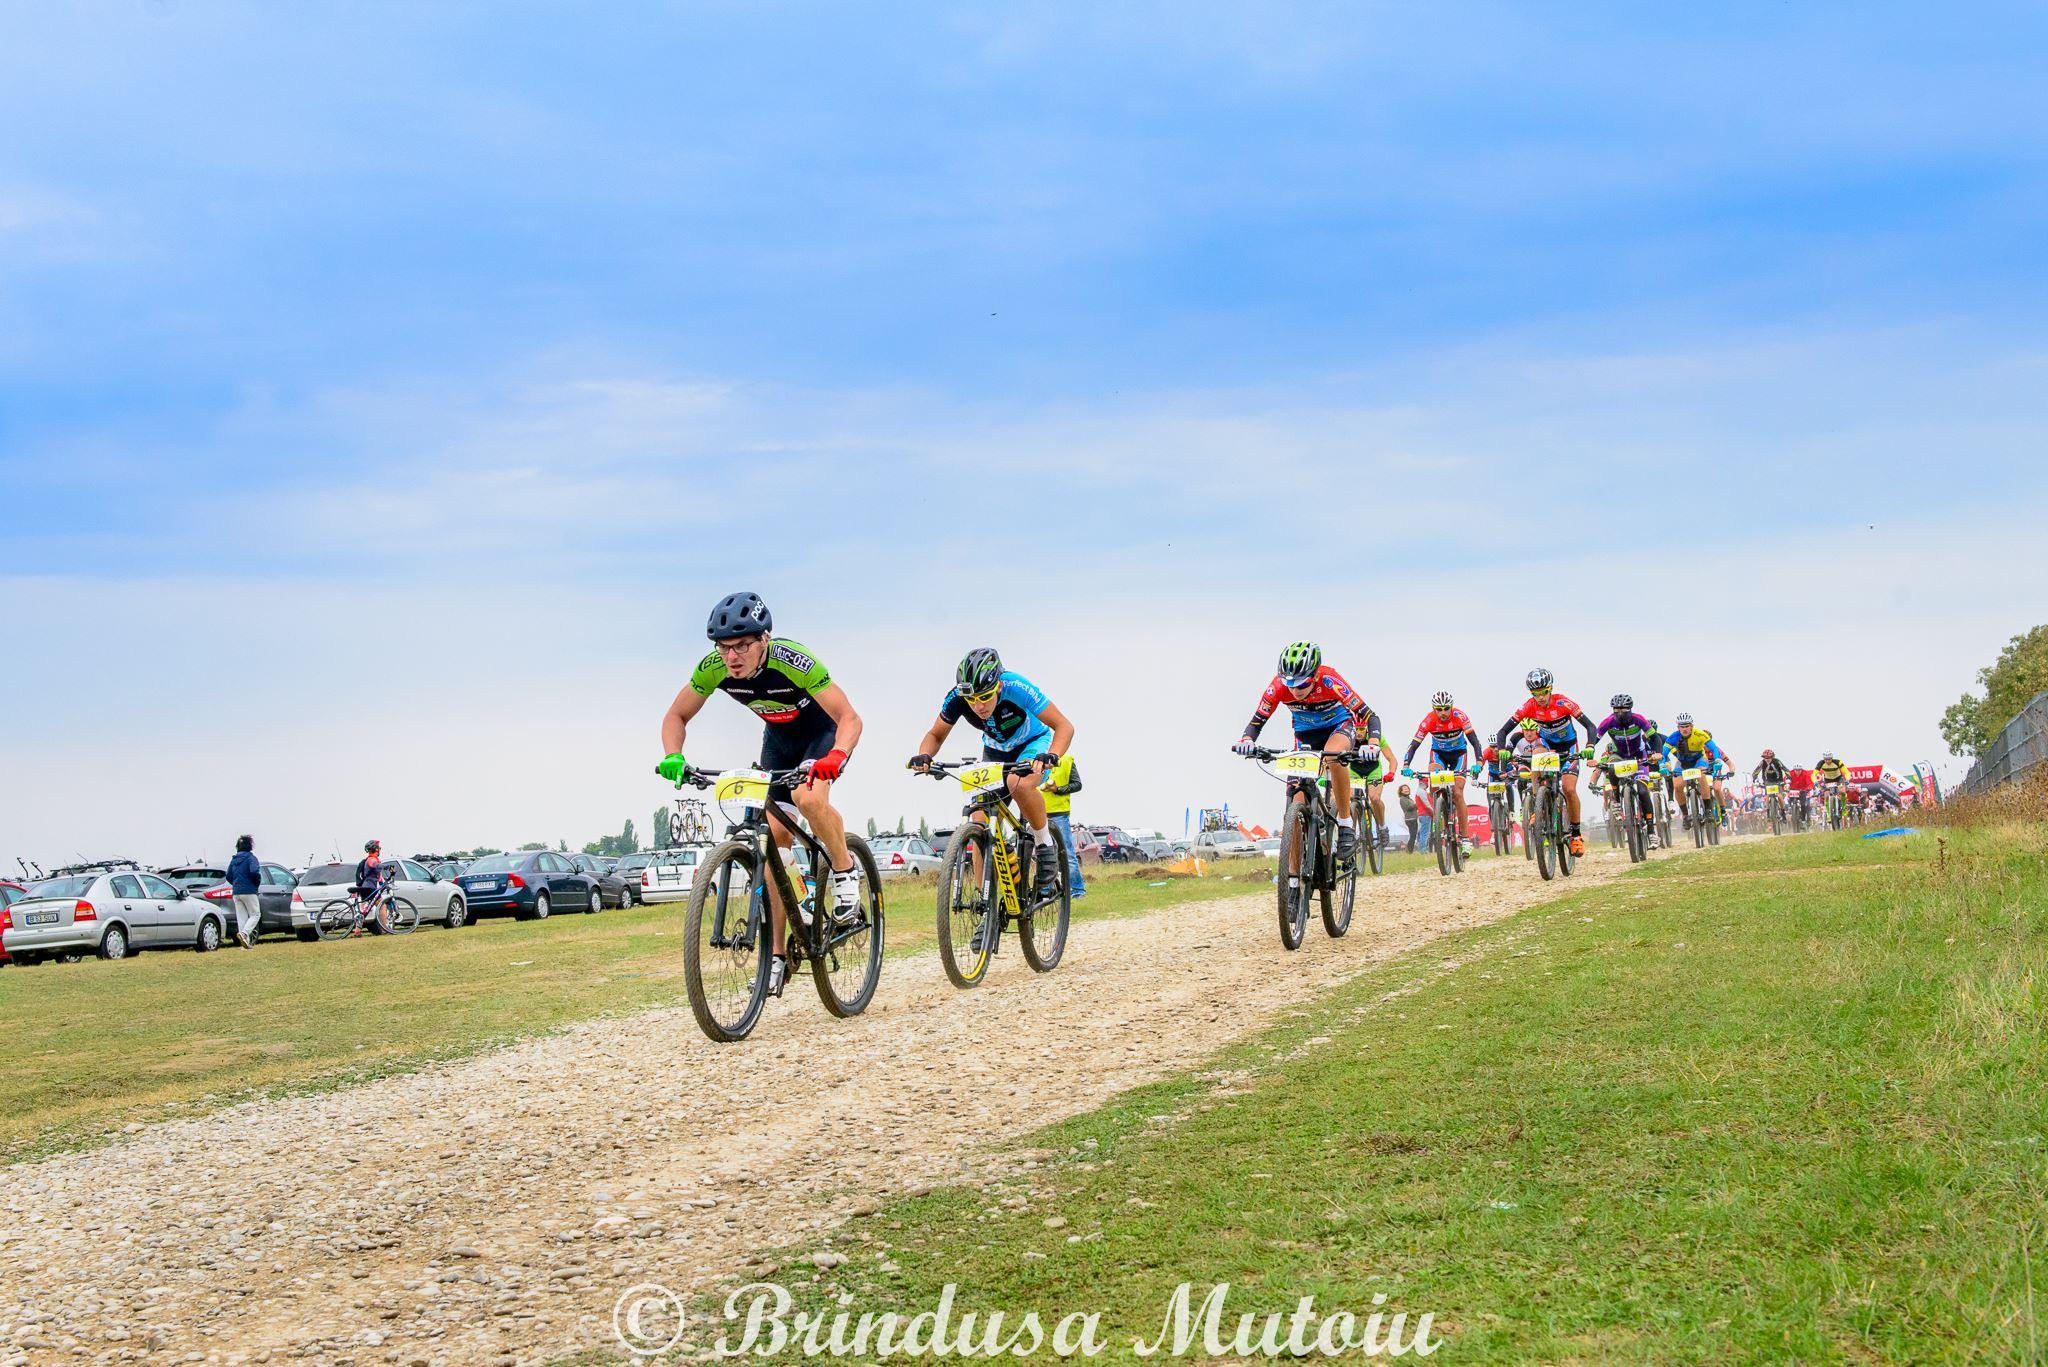 Ciclism: sa nu renunti niciodata si sa continui sa faci pasi inainte, oricat de mici ar fi ei